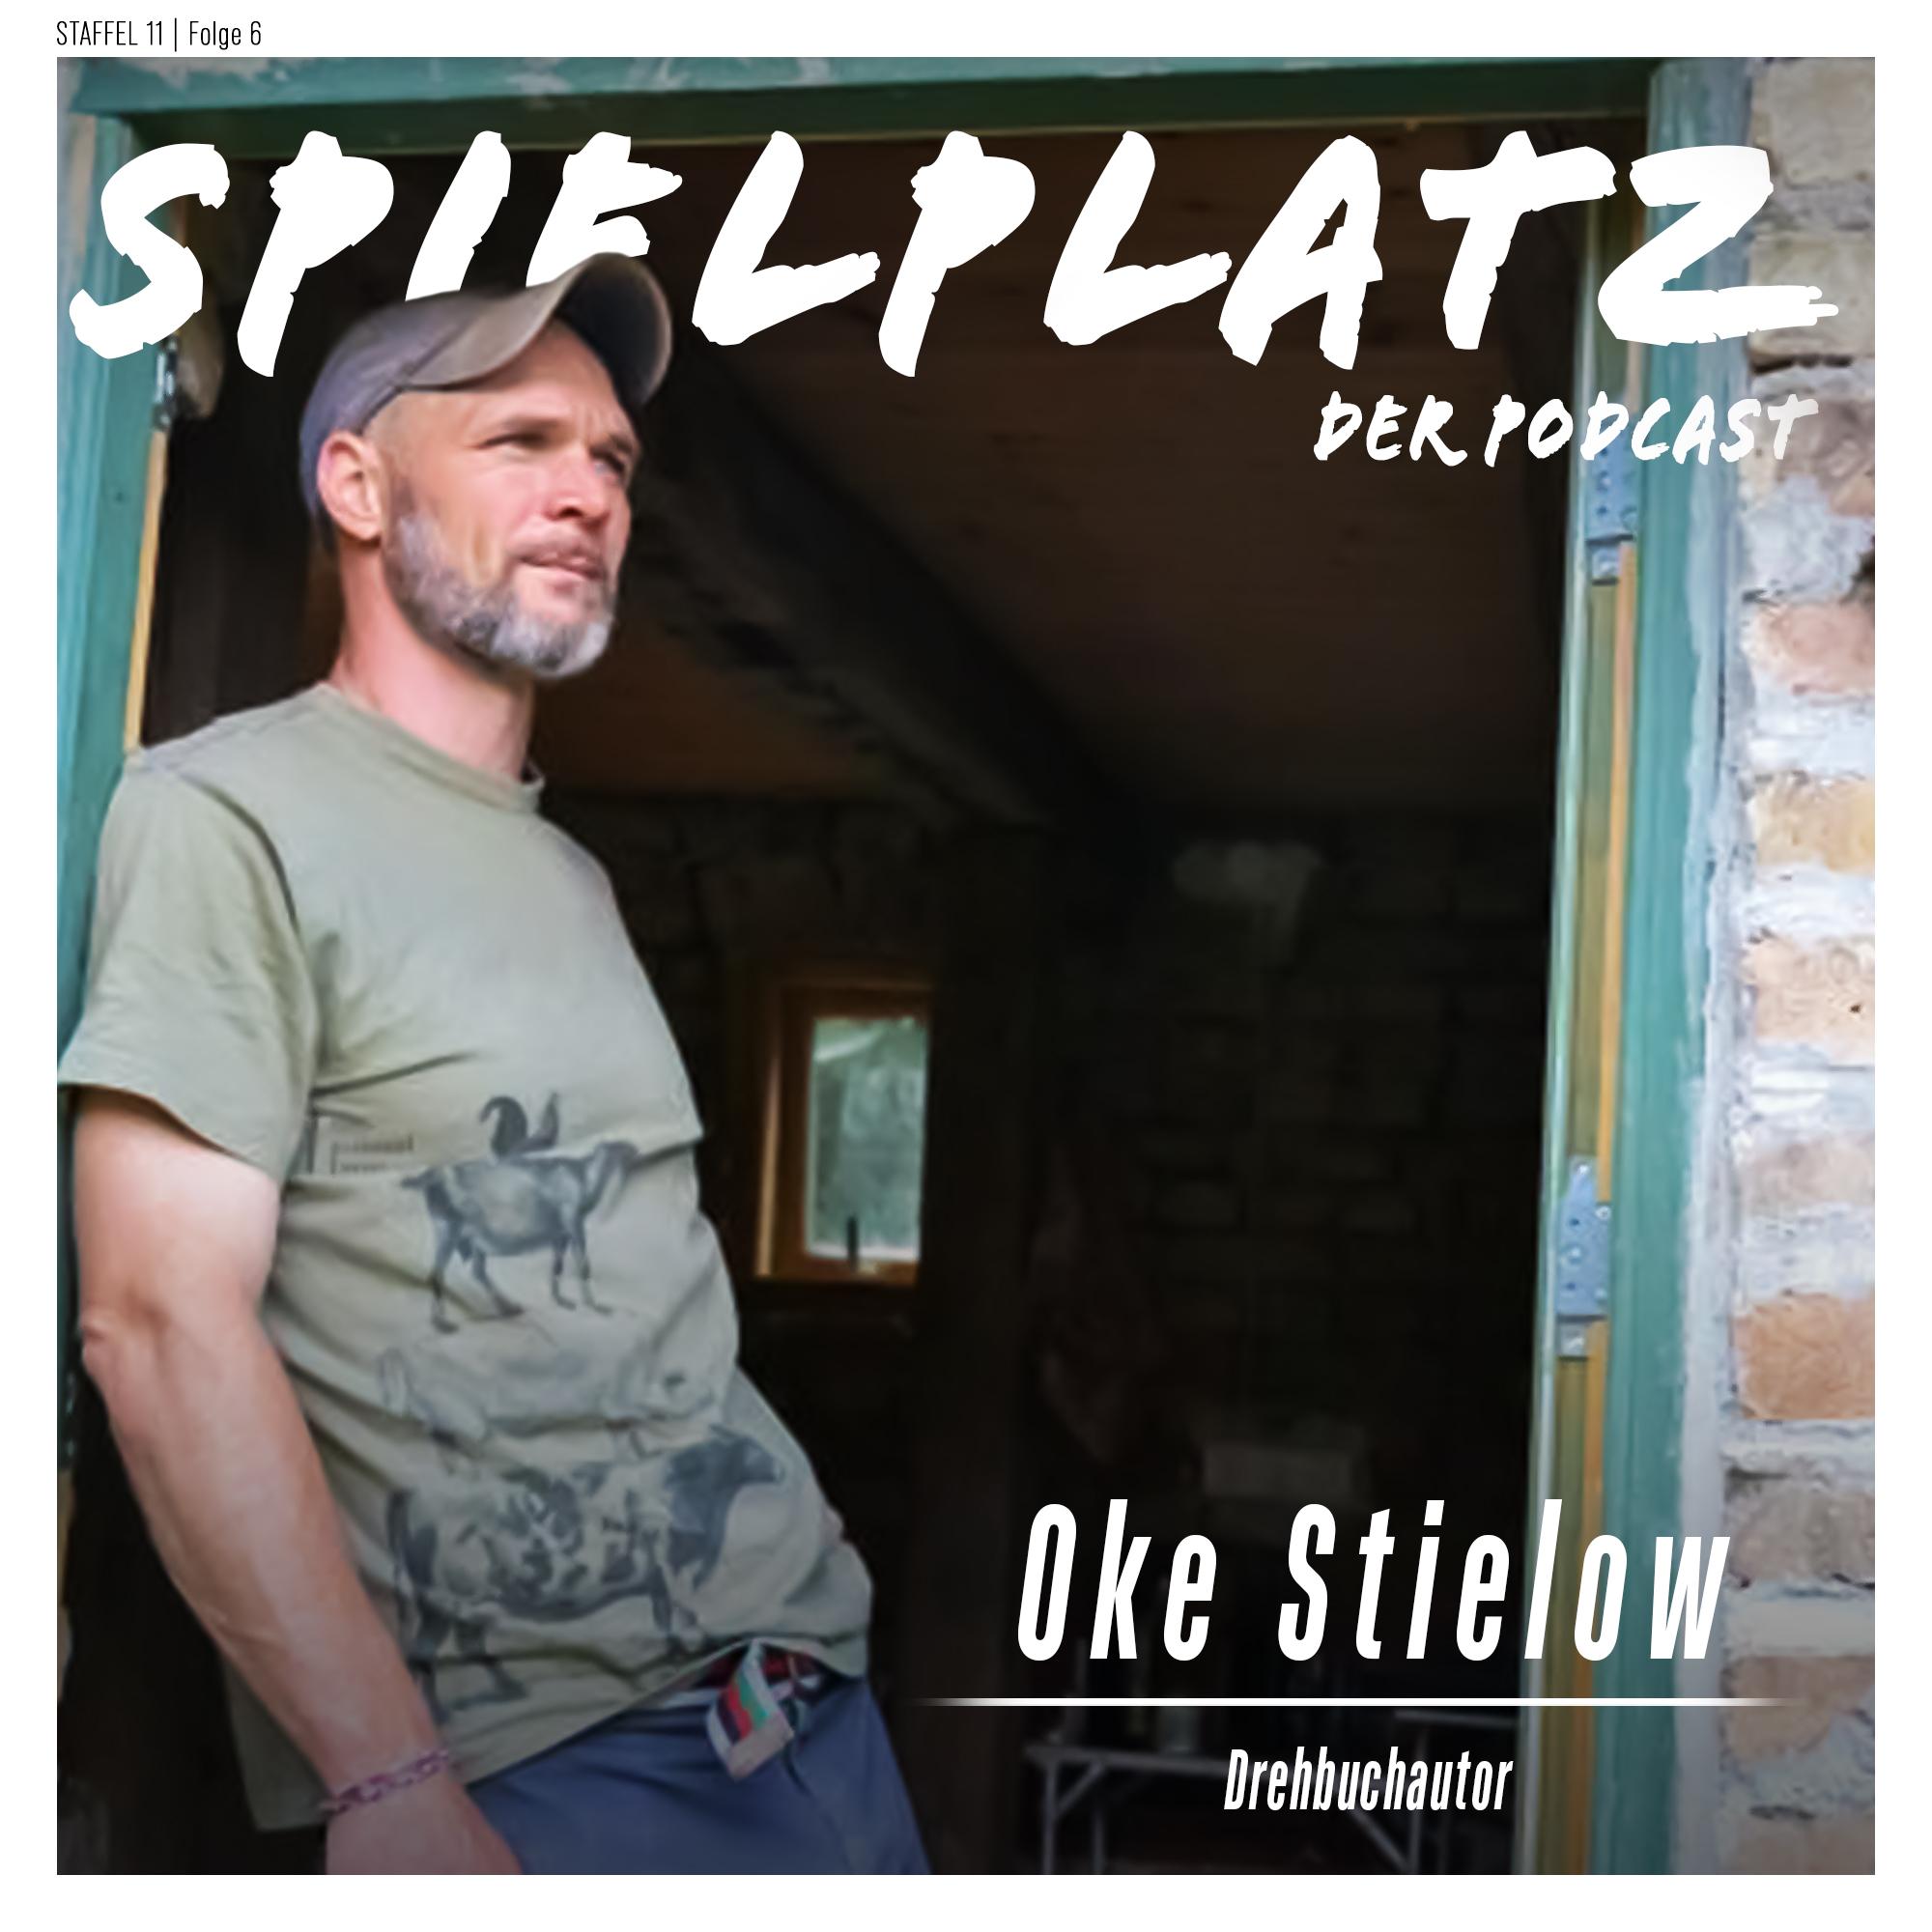 Oke Stielow - Drehbuchautor